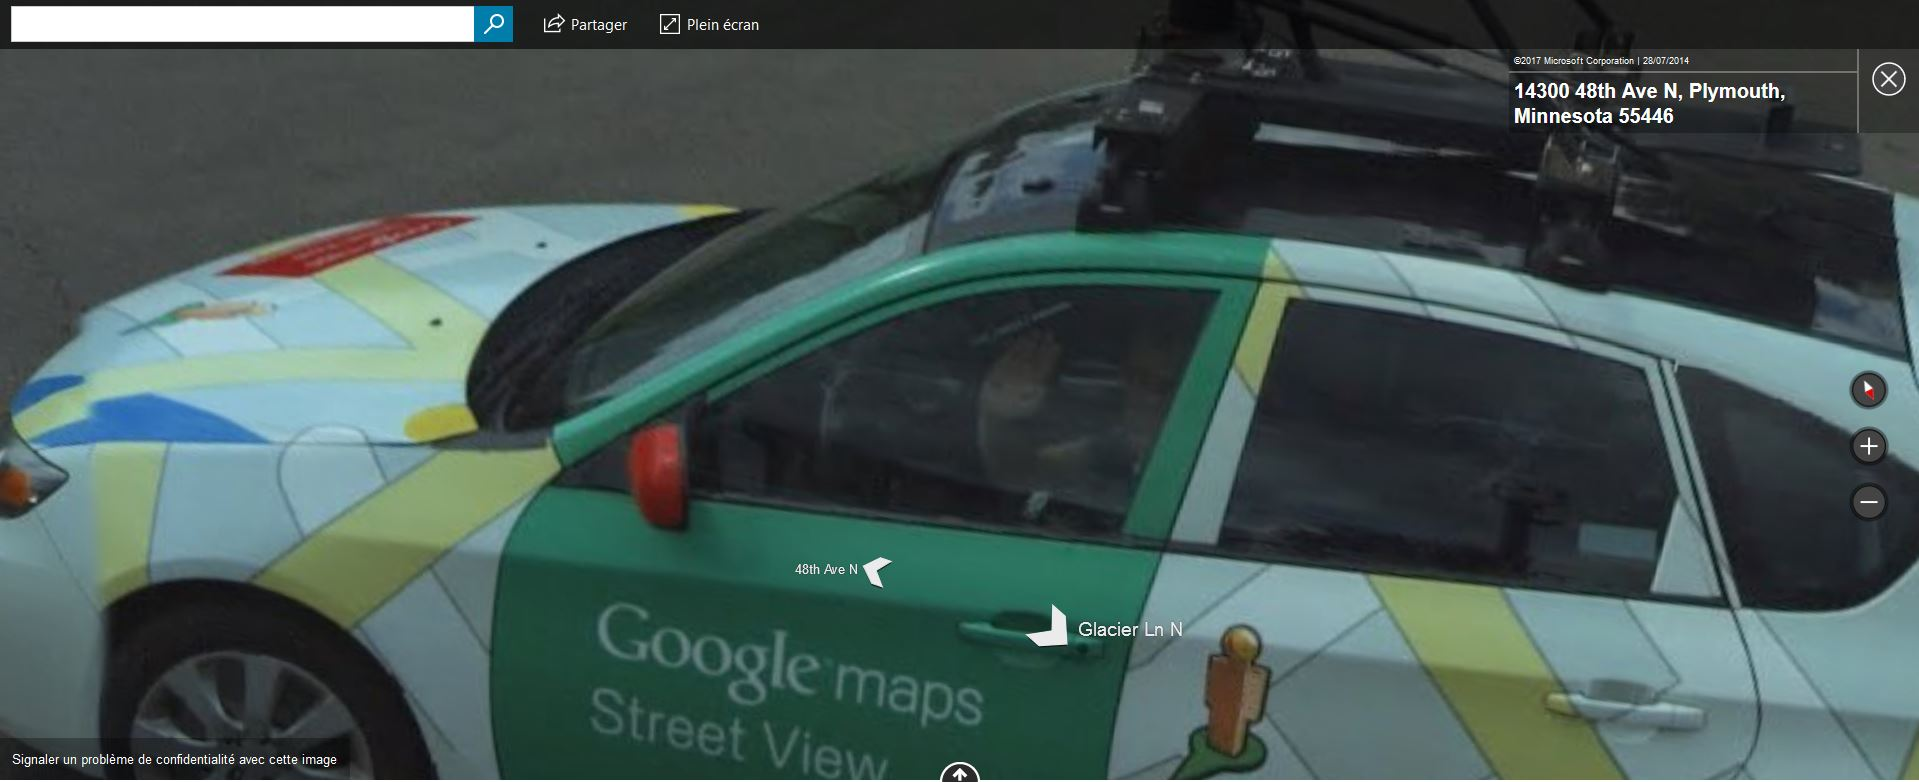 Google-Car contre Bing-Car - Plymouth - Minnesota Tsge_273